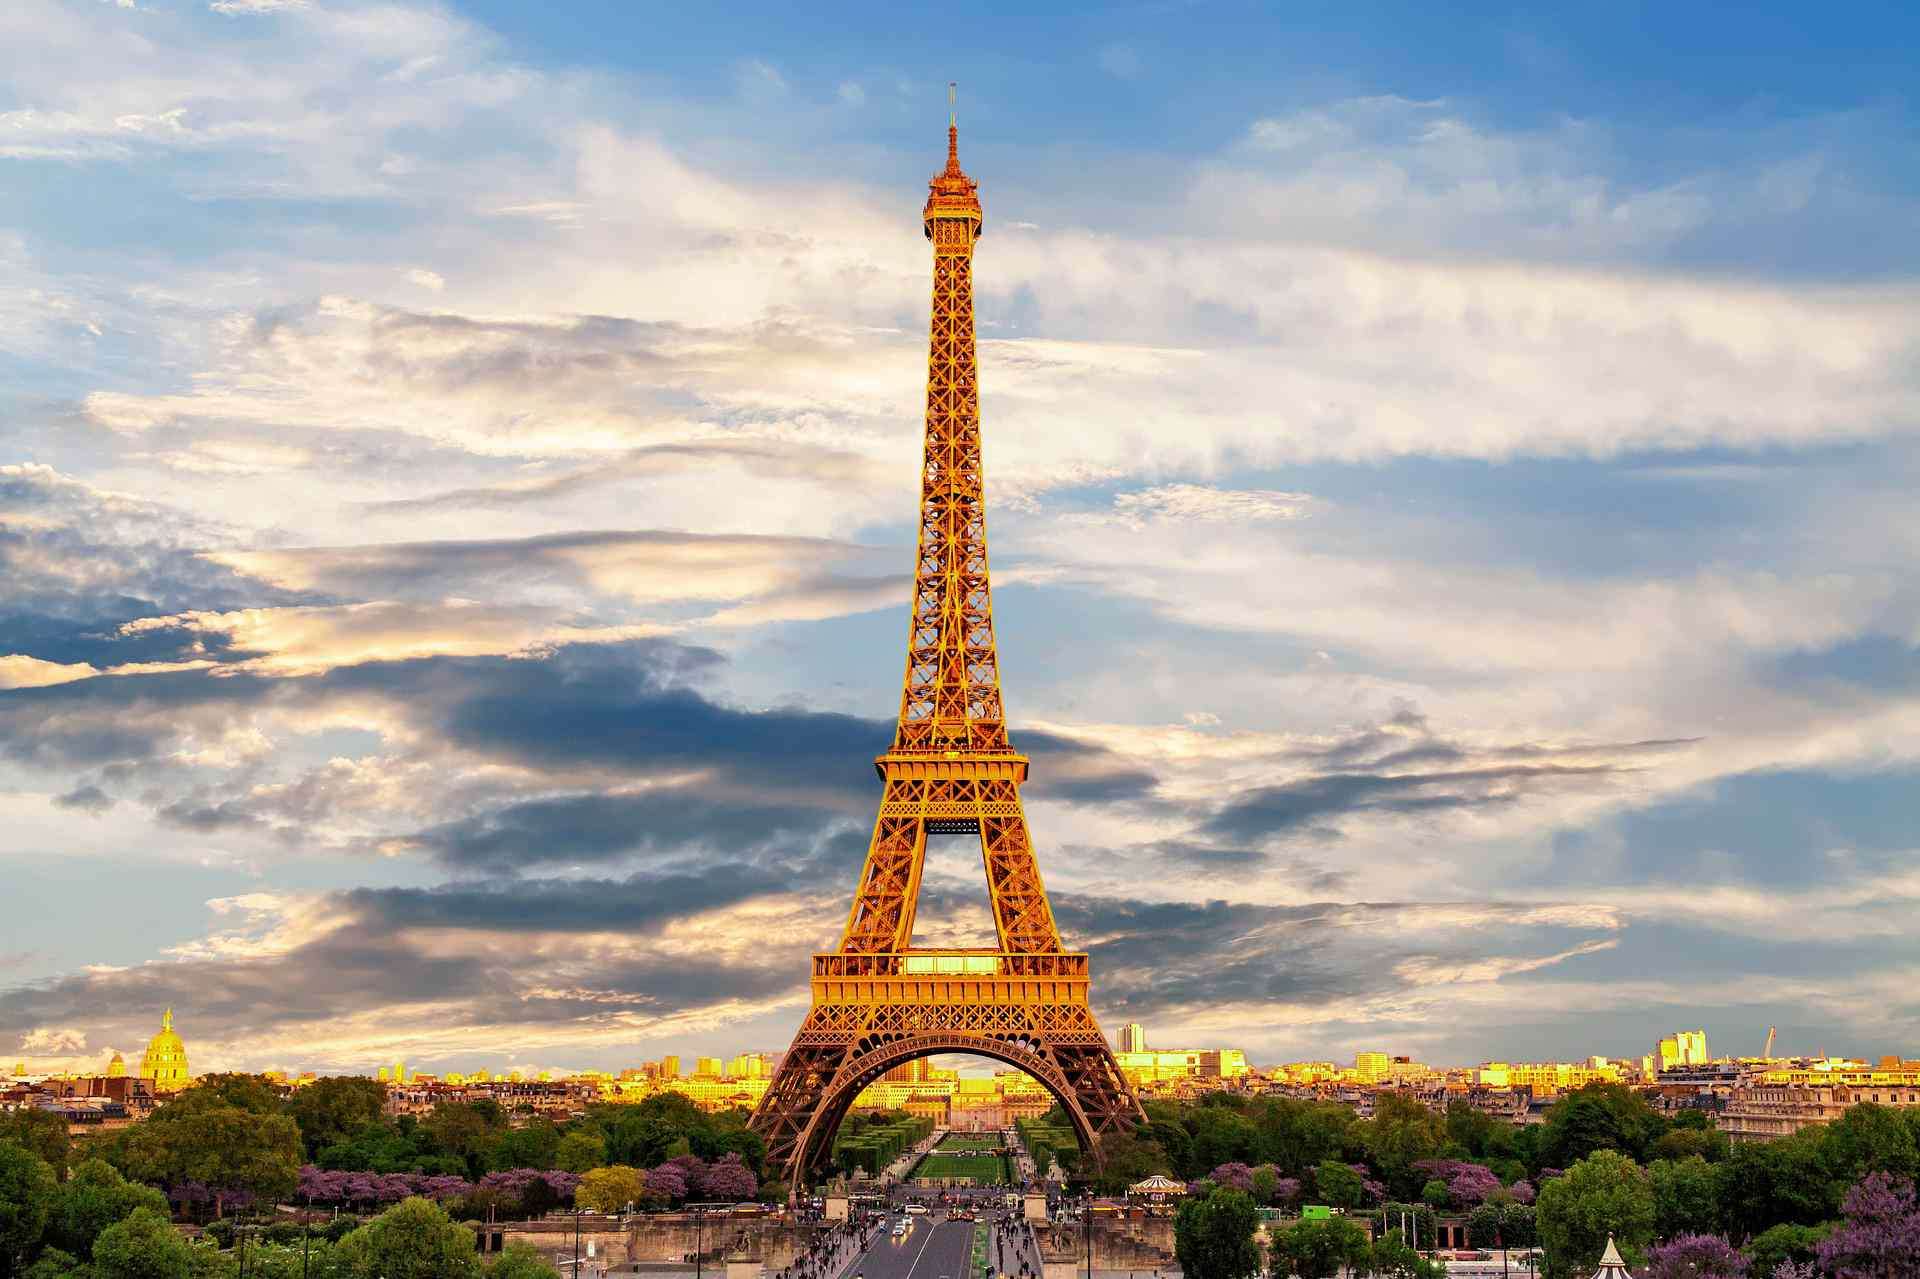 The Eiffel Tower in Paris against a blue sky.